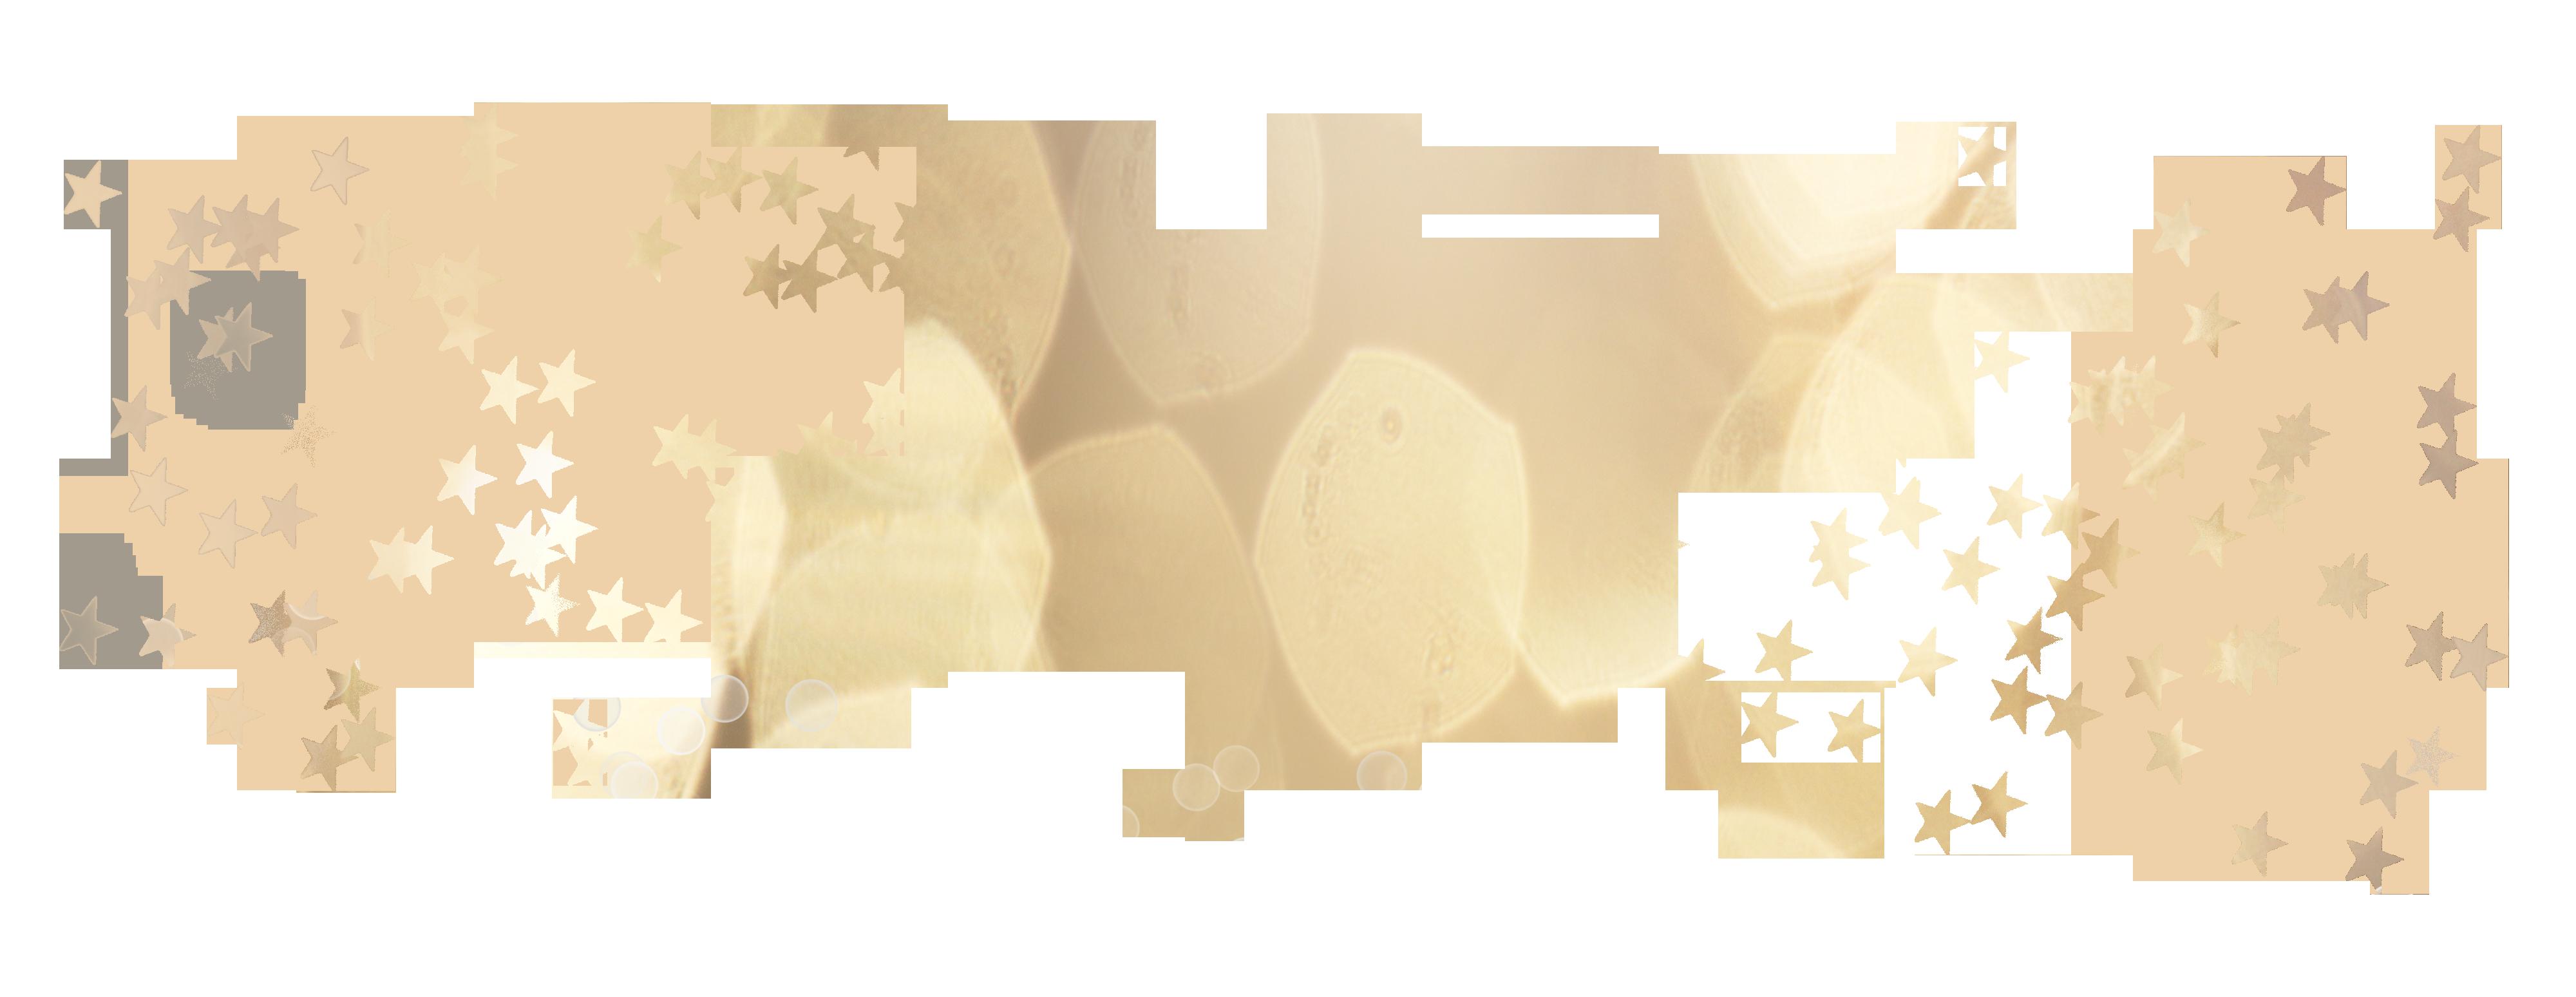 نجوم لمعه Light Star Freetoedit Bokeh Light Condiments